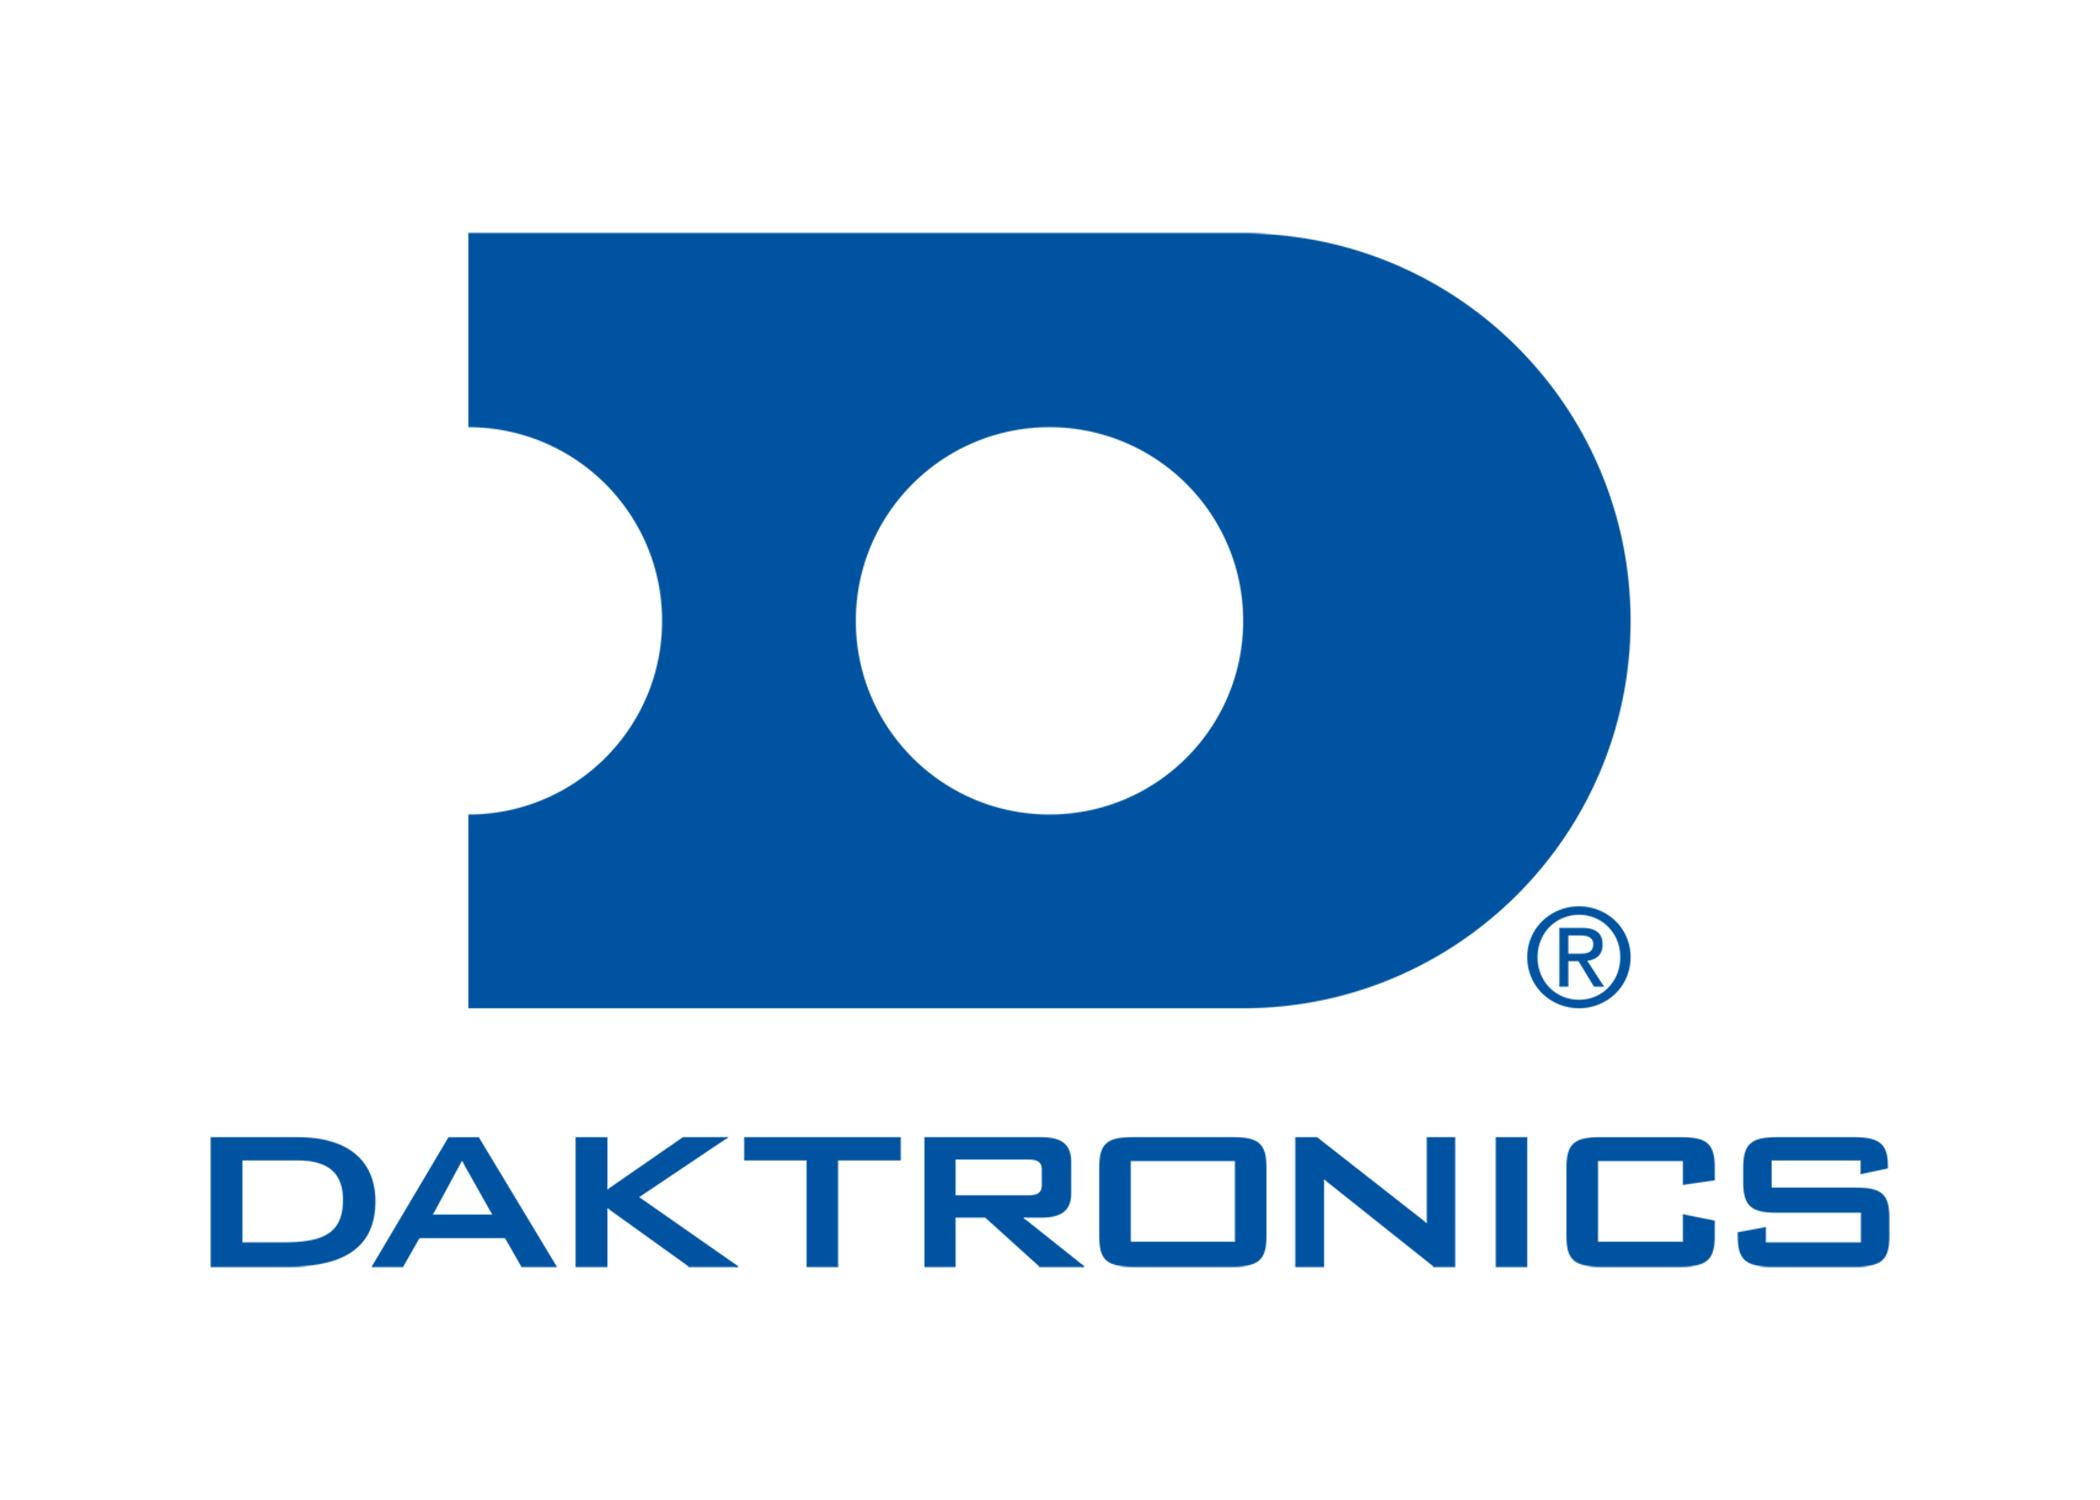 Daktronics(Correct).jpg